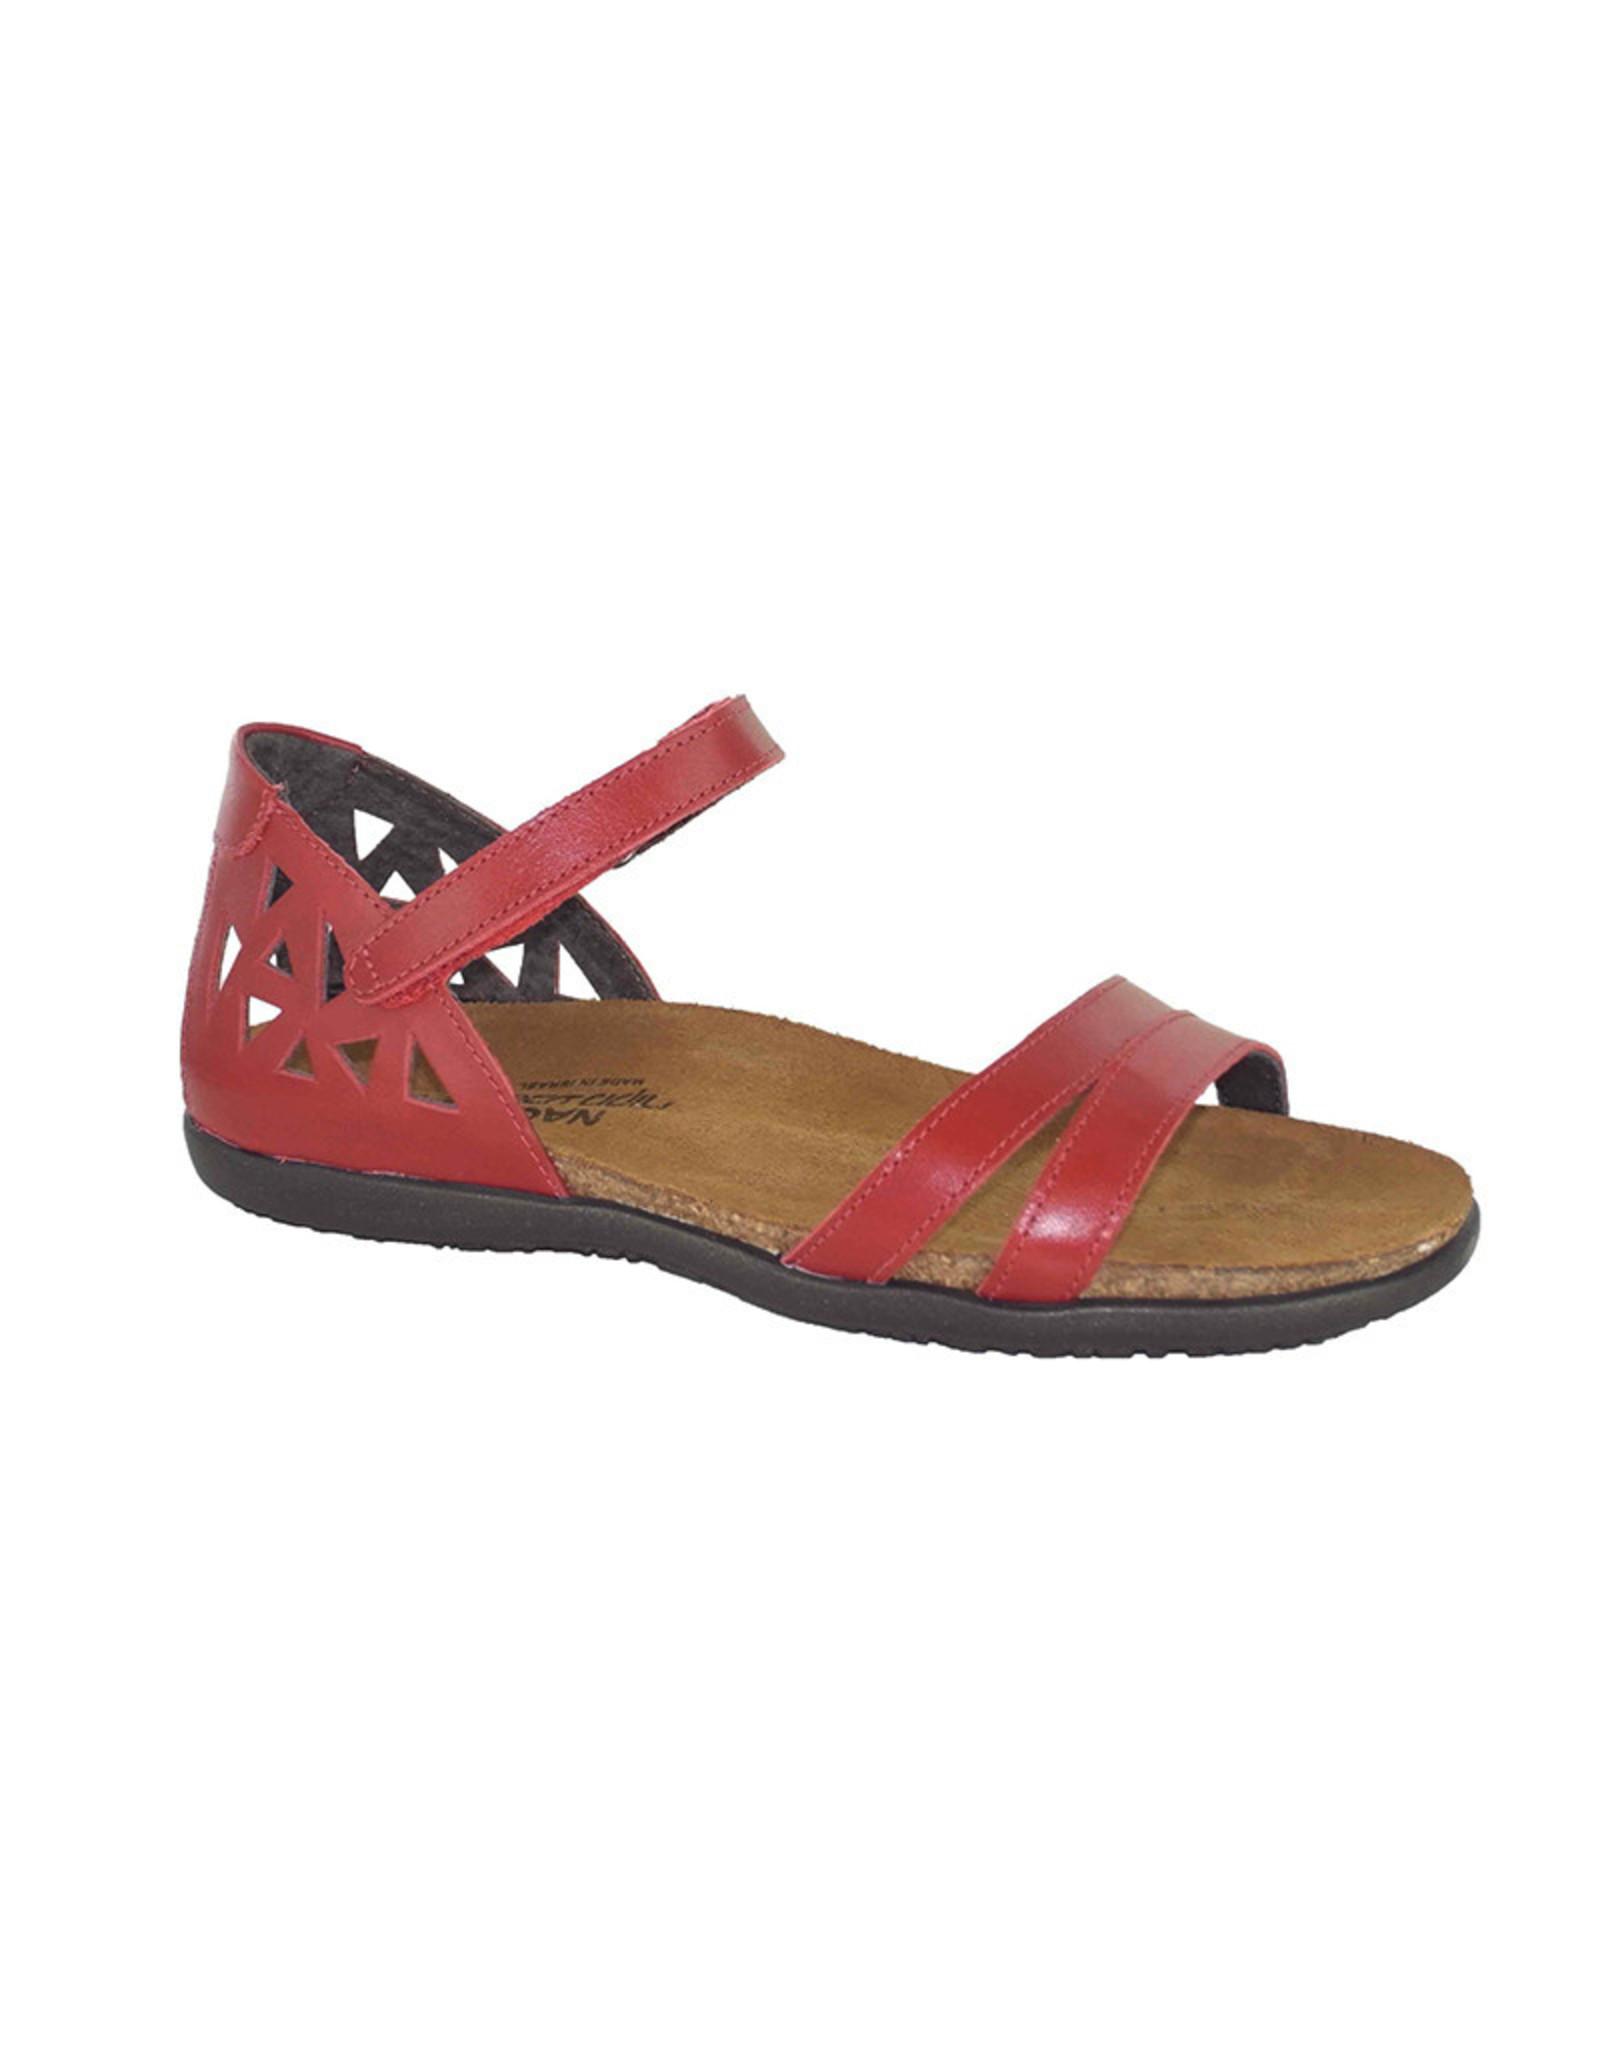 Naot Footwear Bonnie in Poppy